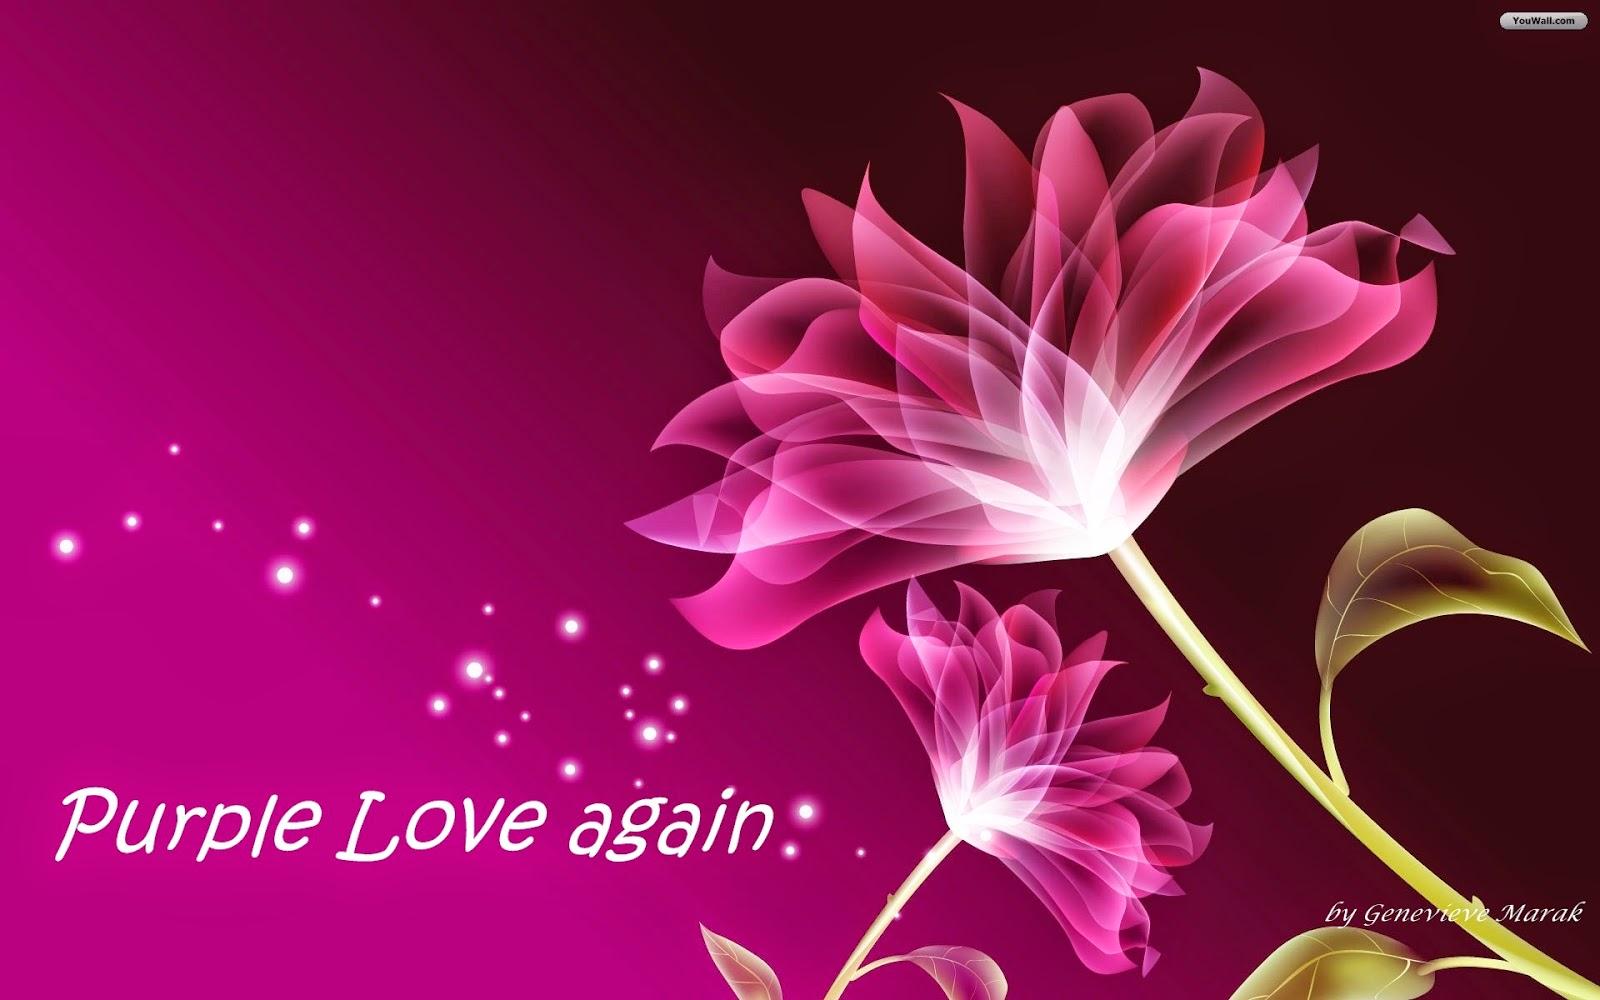 color me bold purple love again